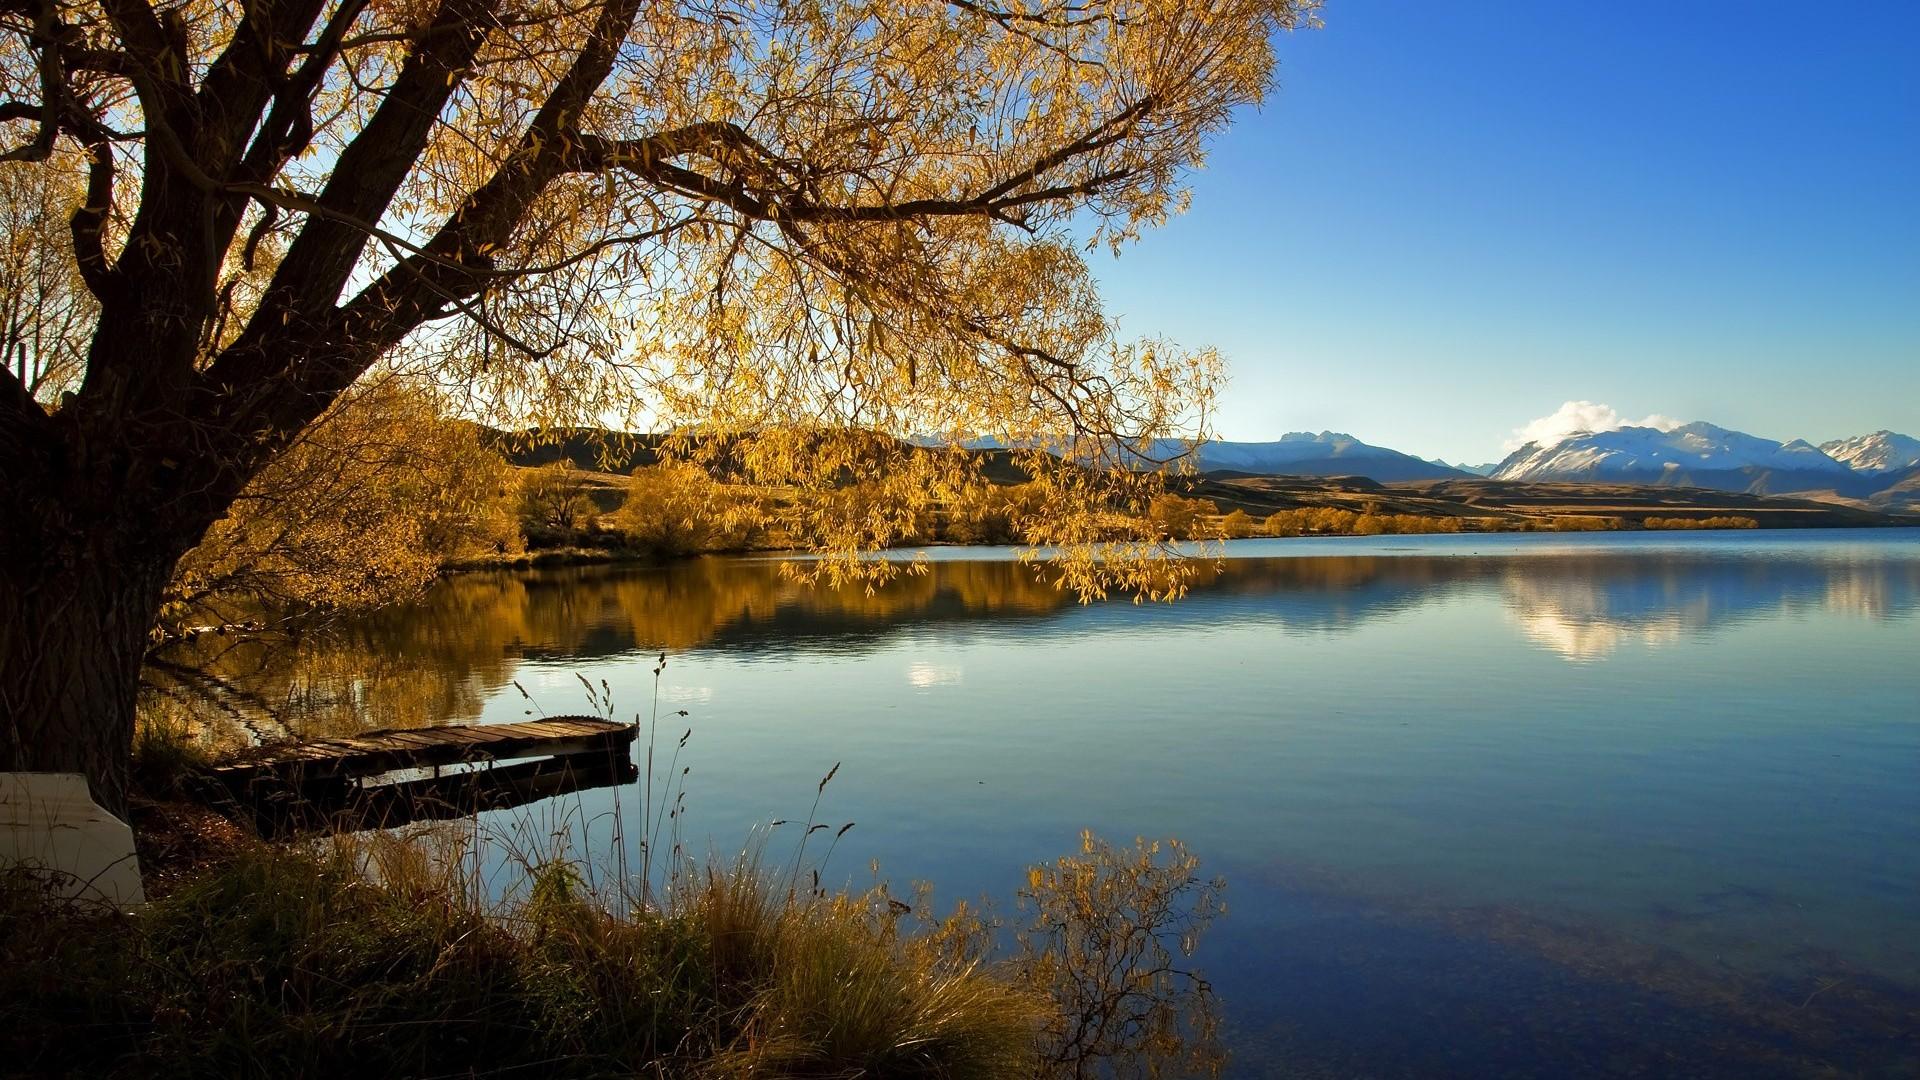 Water scenes TheWallpapers | Free Desktop Wallpapers for HD ...